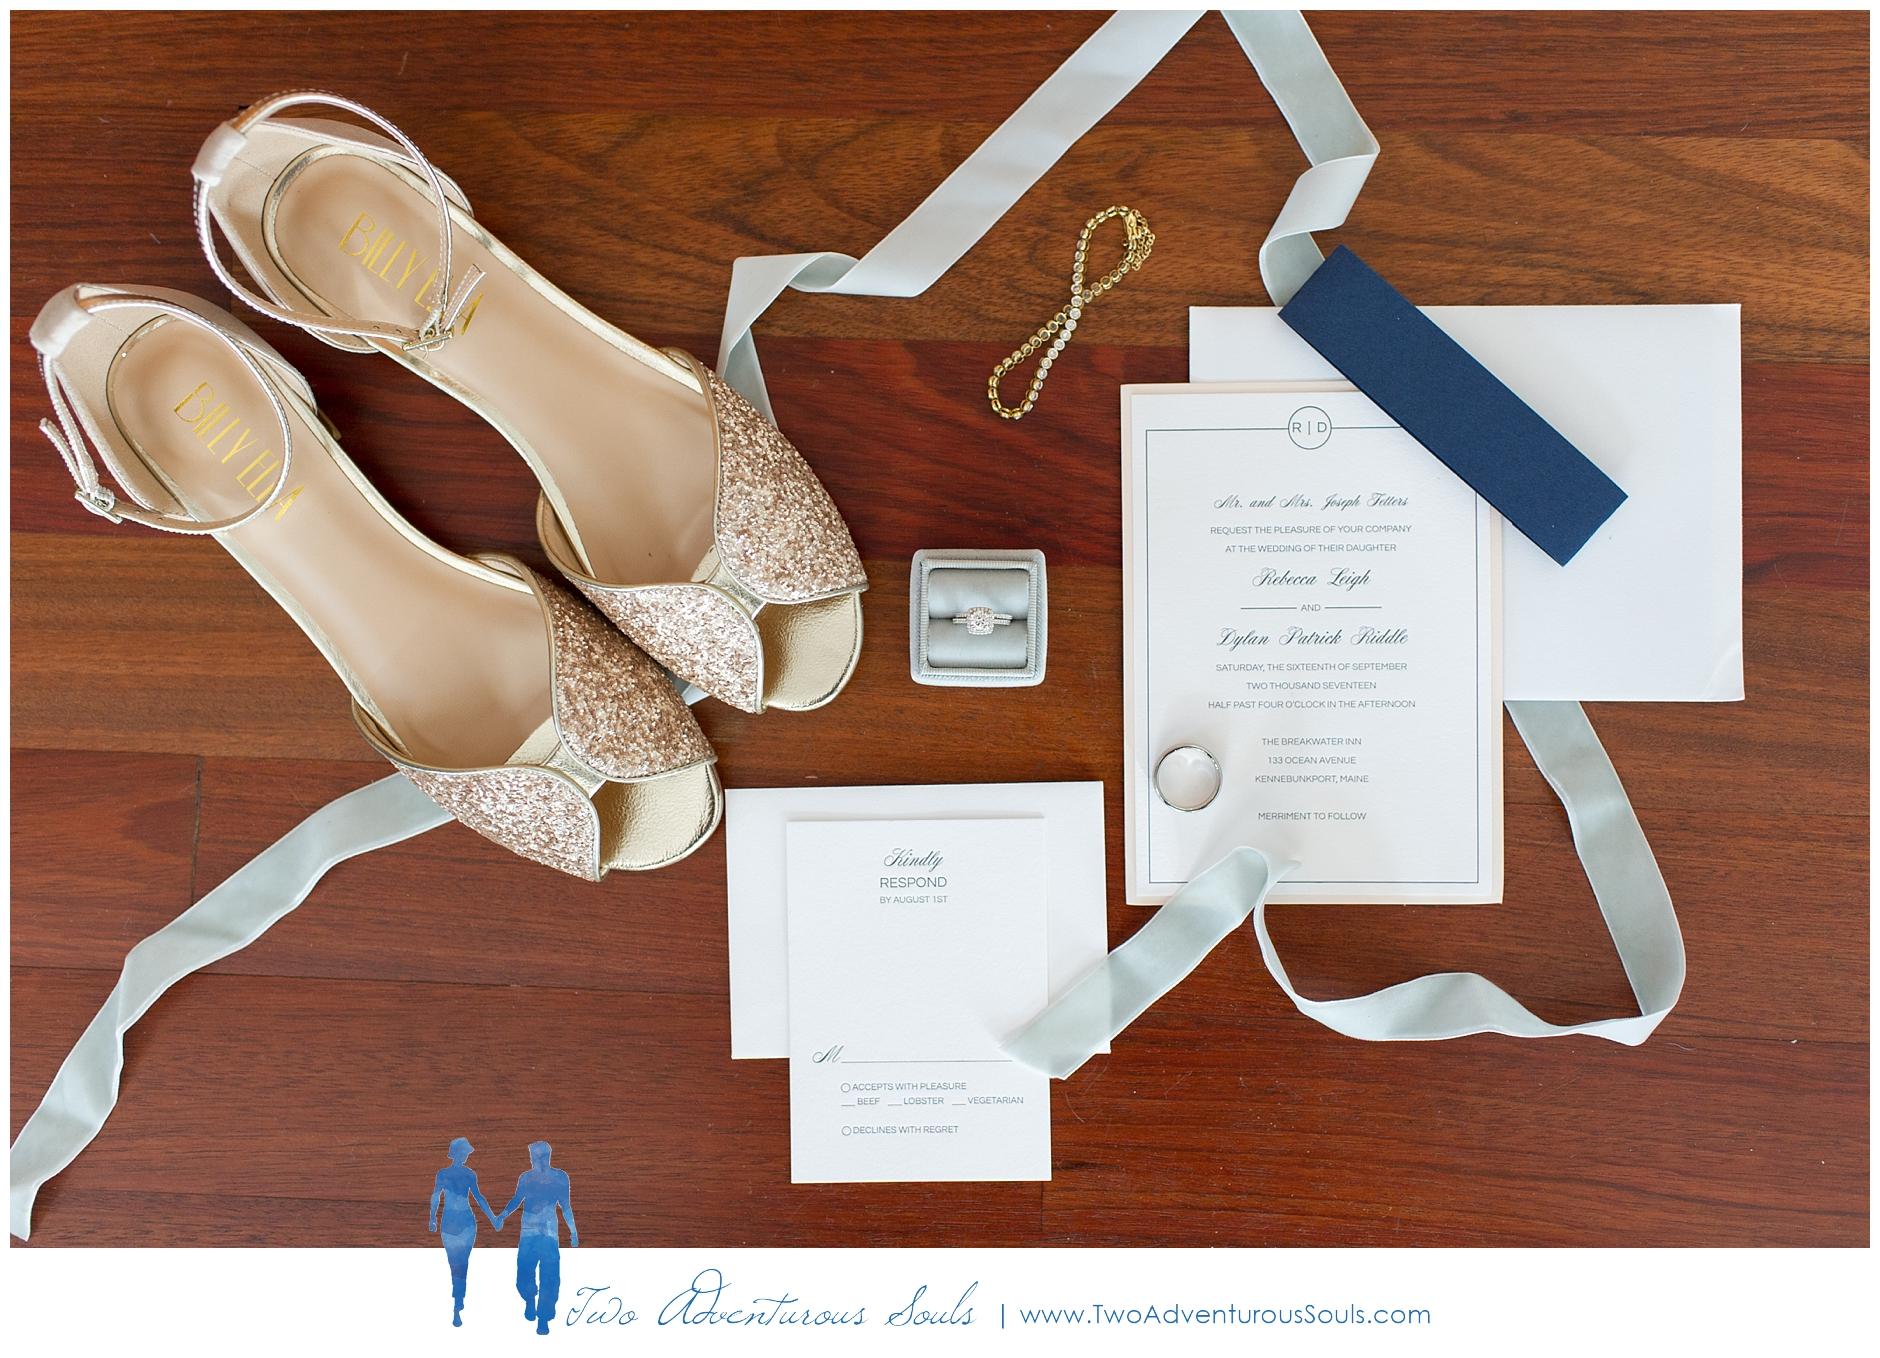 Breakwater Inn and Spa Wedding, Kennebunkport Wedding, Maine Wedding -